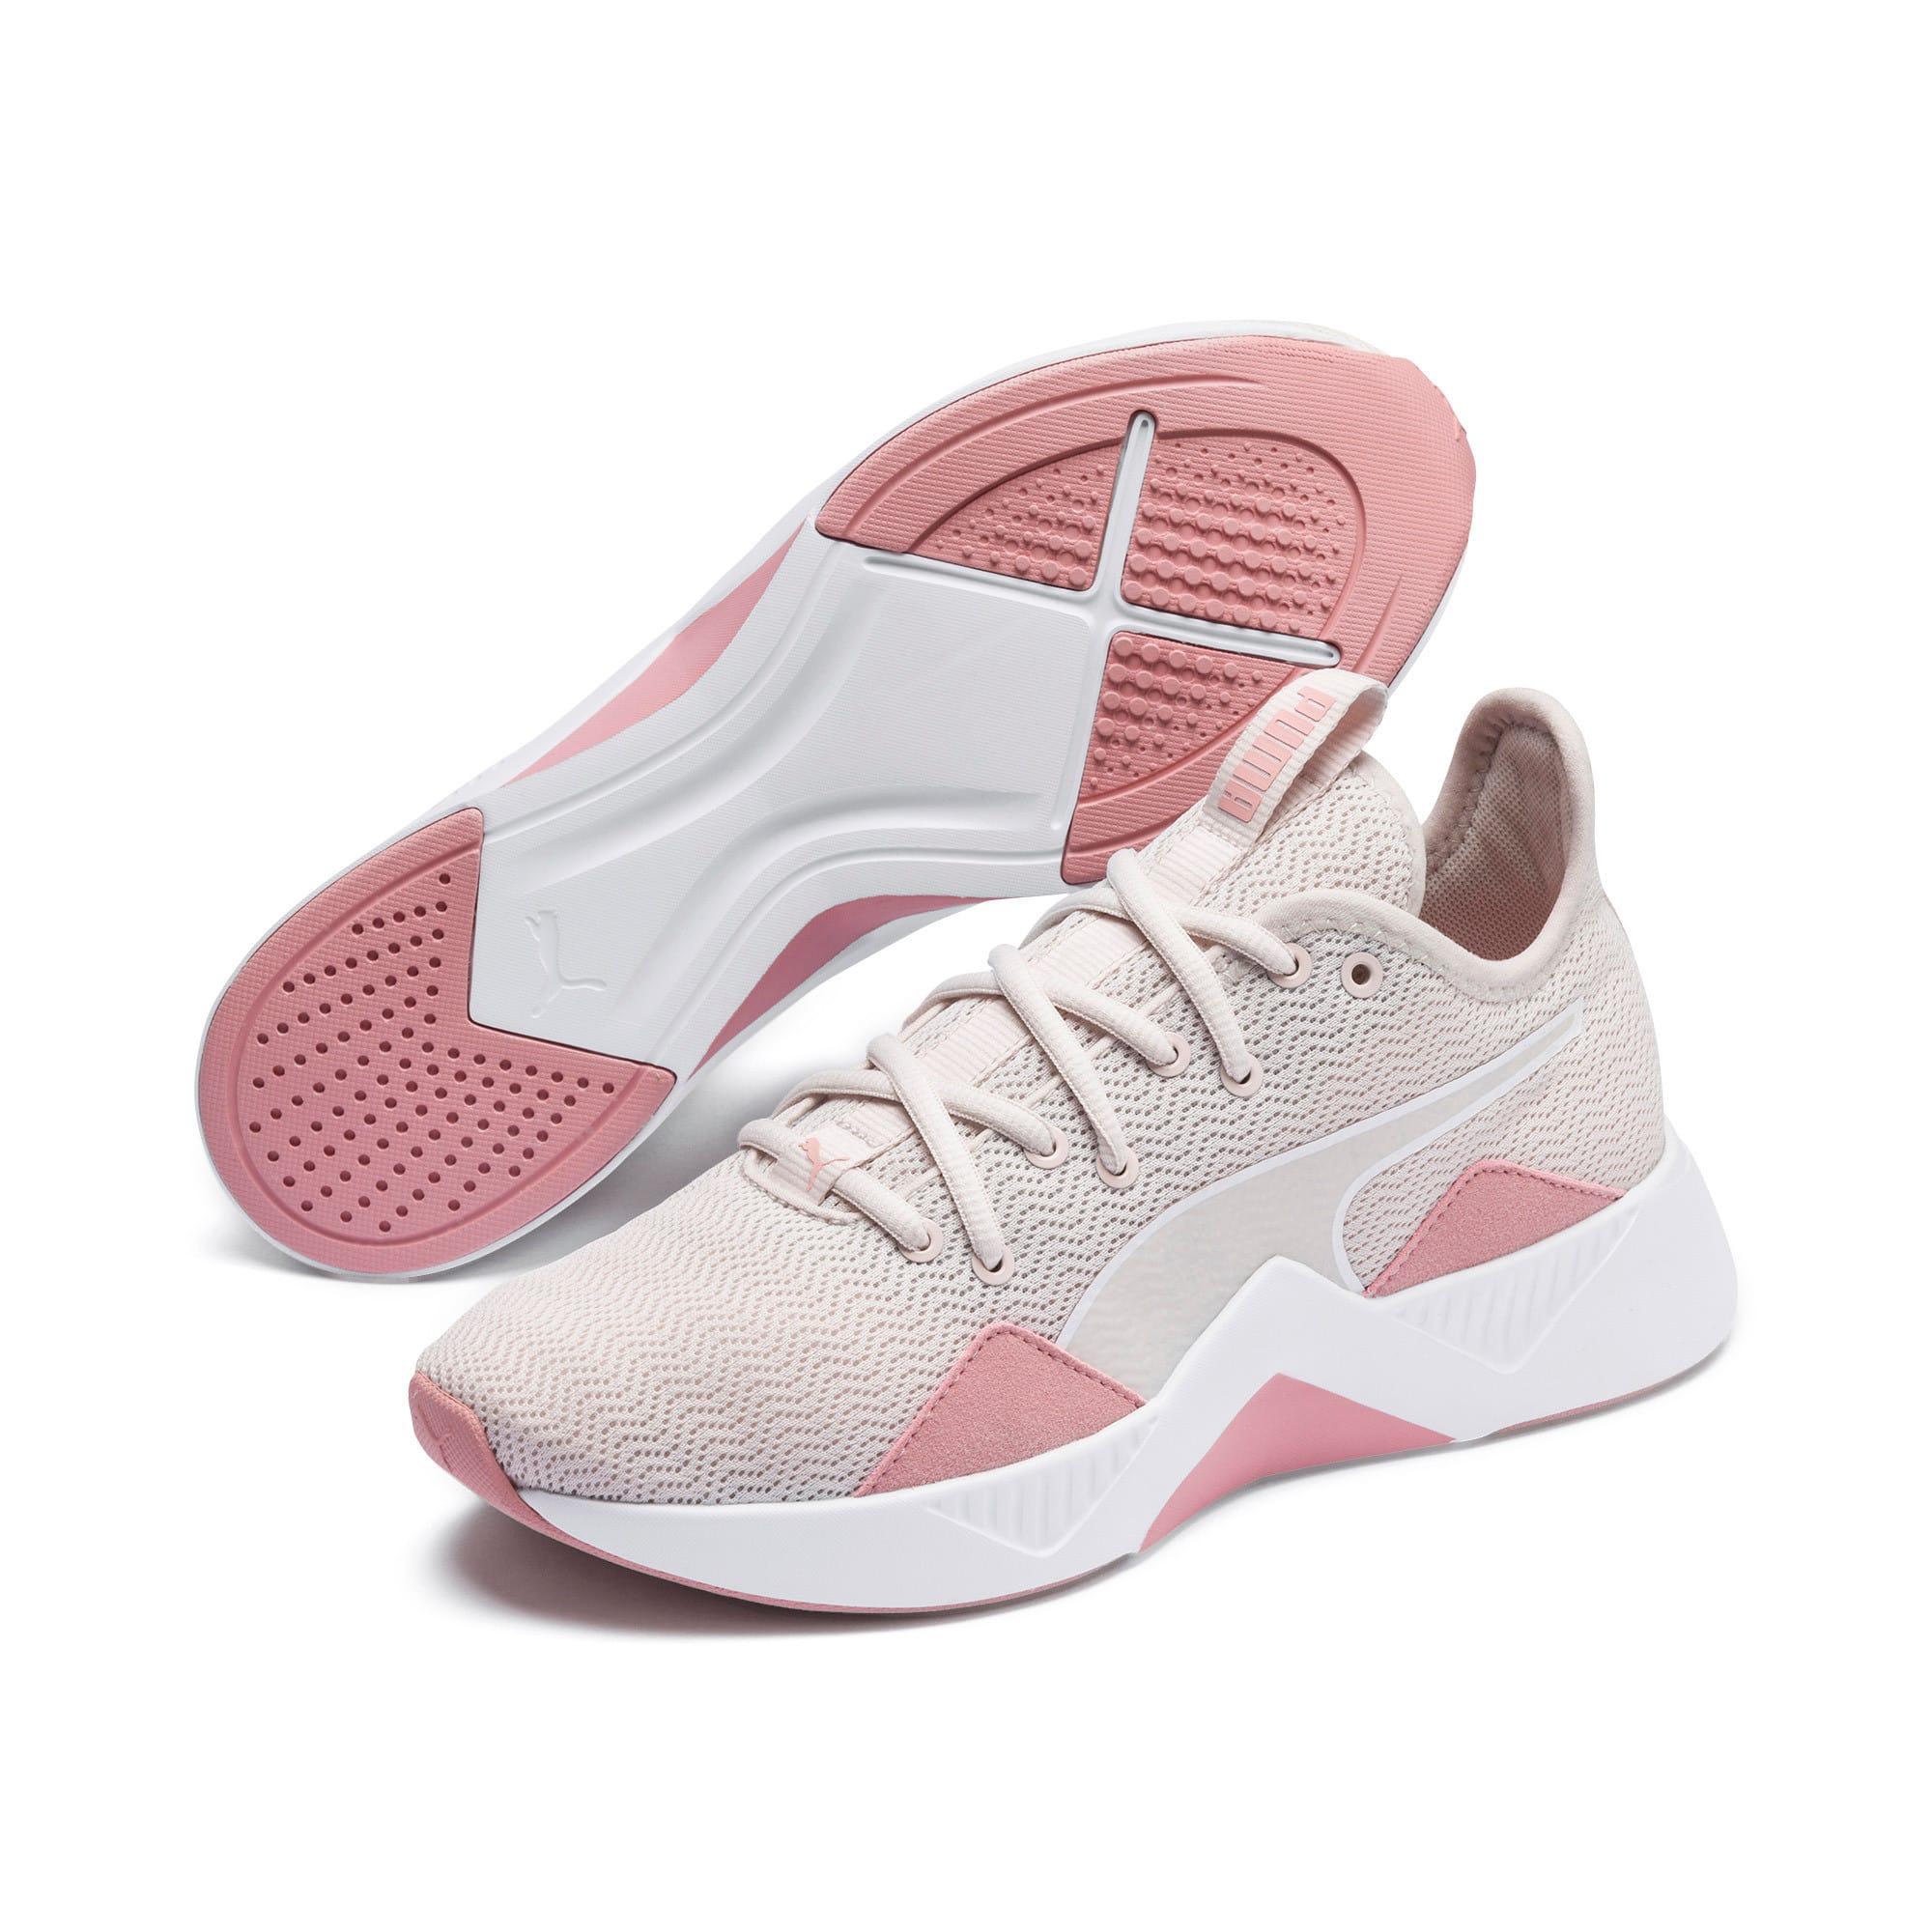 Thumbnail 2 of Incite FS Shift Women's Training Shoes, Pastel Parchment-Rose-White, medium